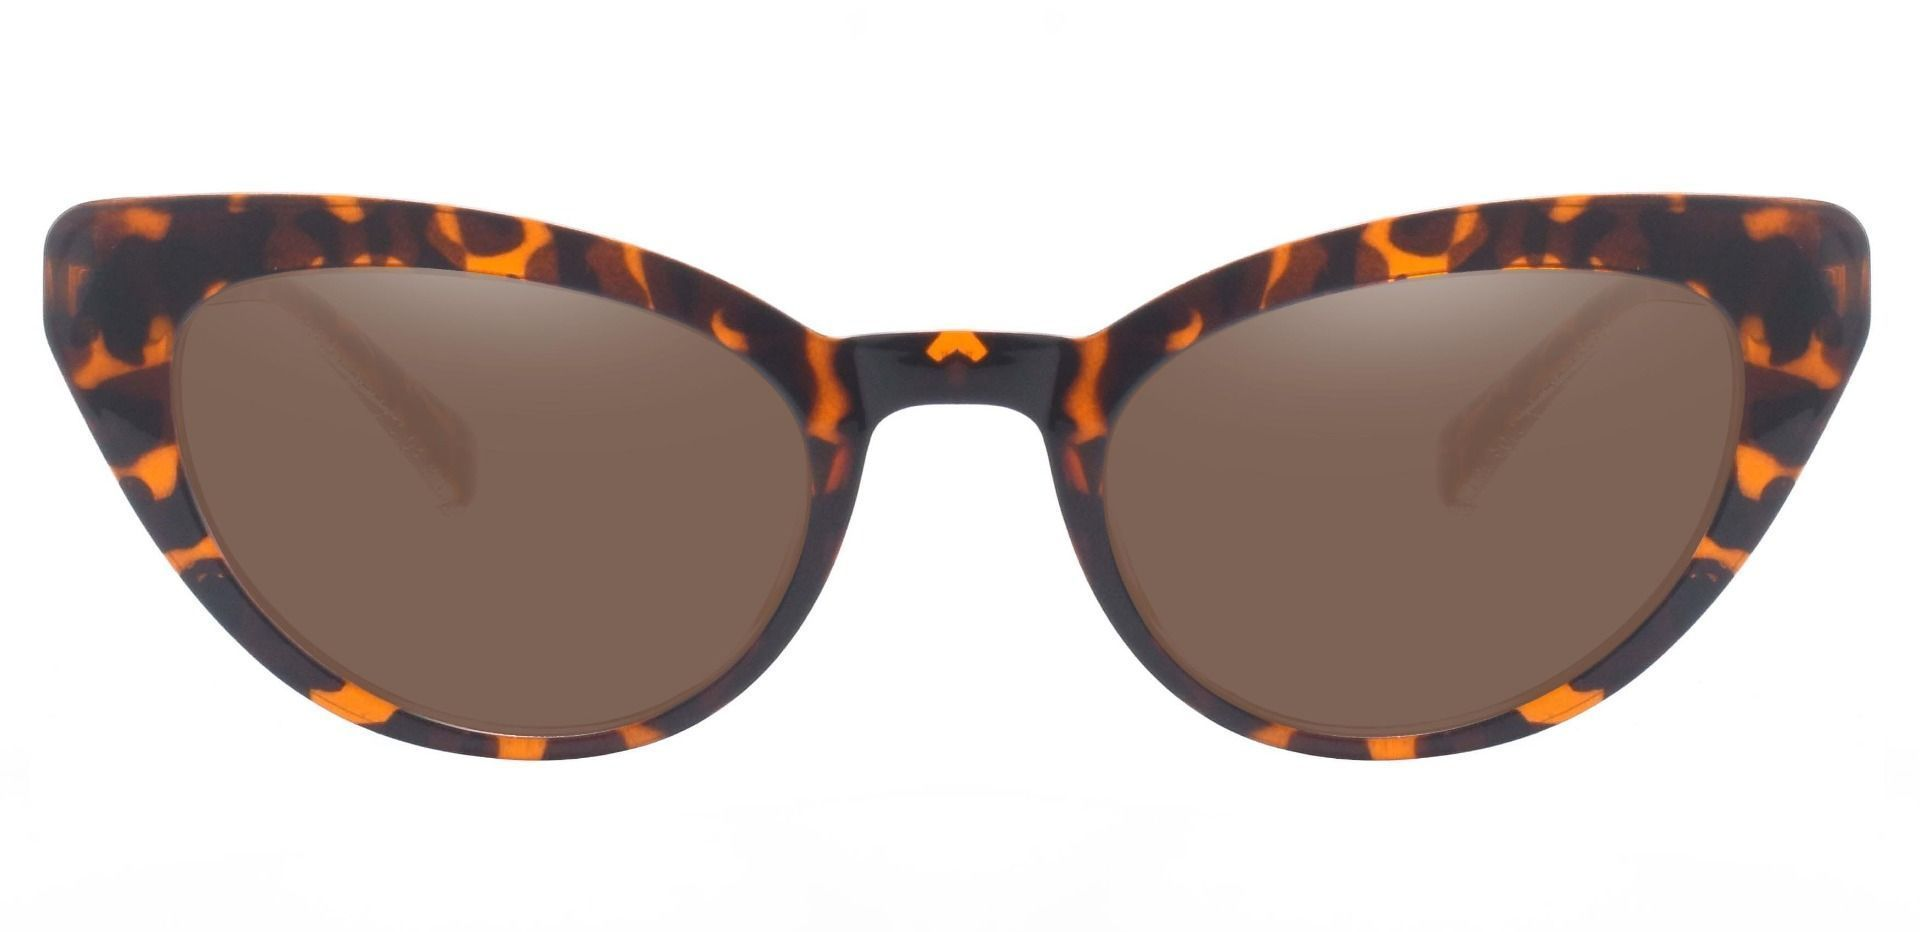 June Cat Eye Prescription Sunglasses - Leopard Frame With Brown Lenses